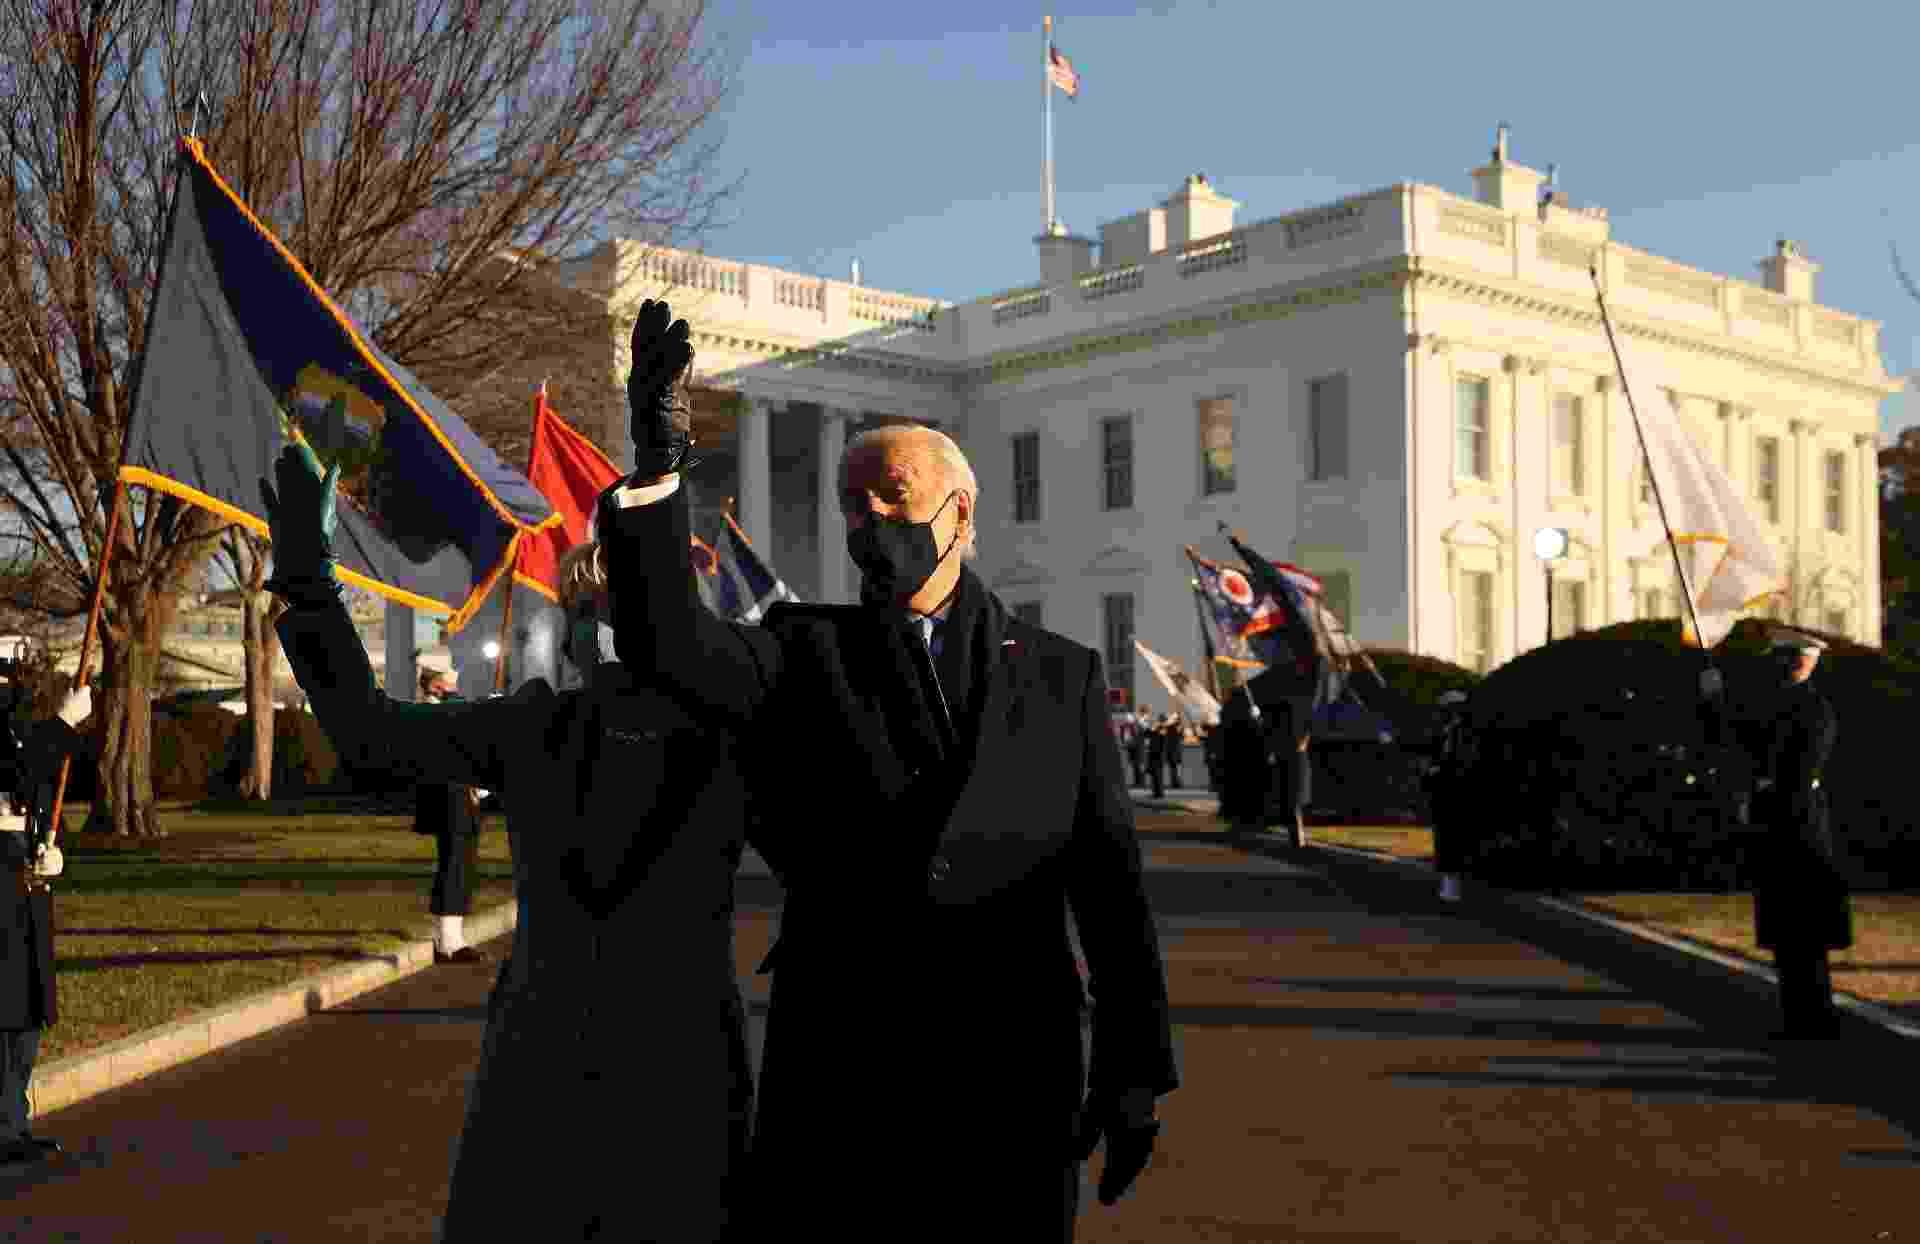 20 jan. 2021 - Presidente Joe Biden chega pela primeira vez à Casa Branca - Chip Somodevilla/Getty Images